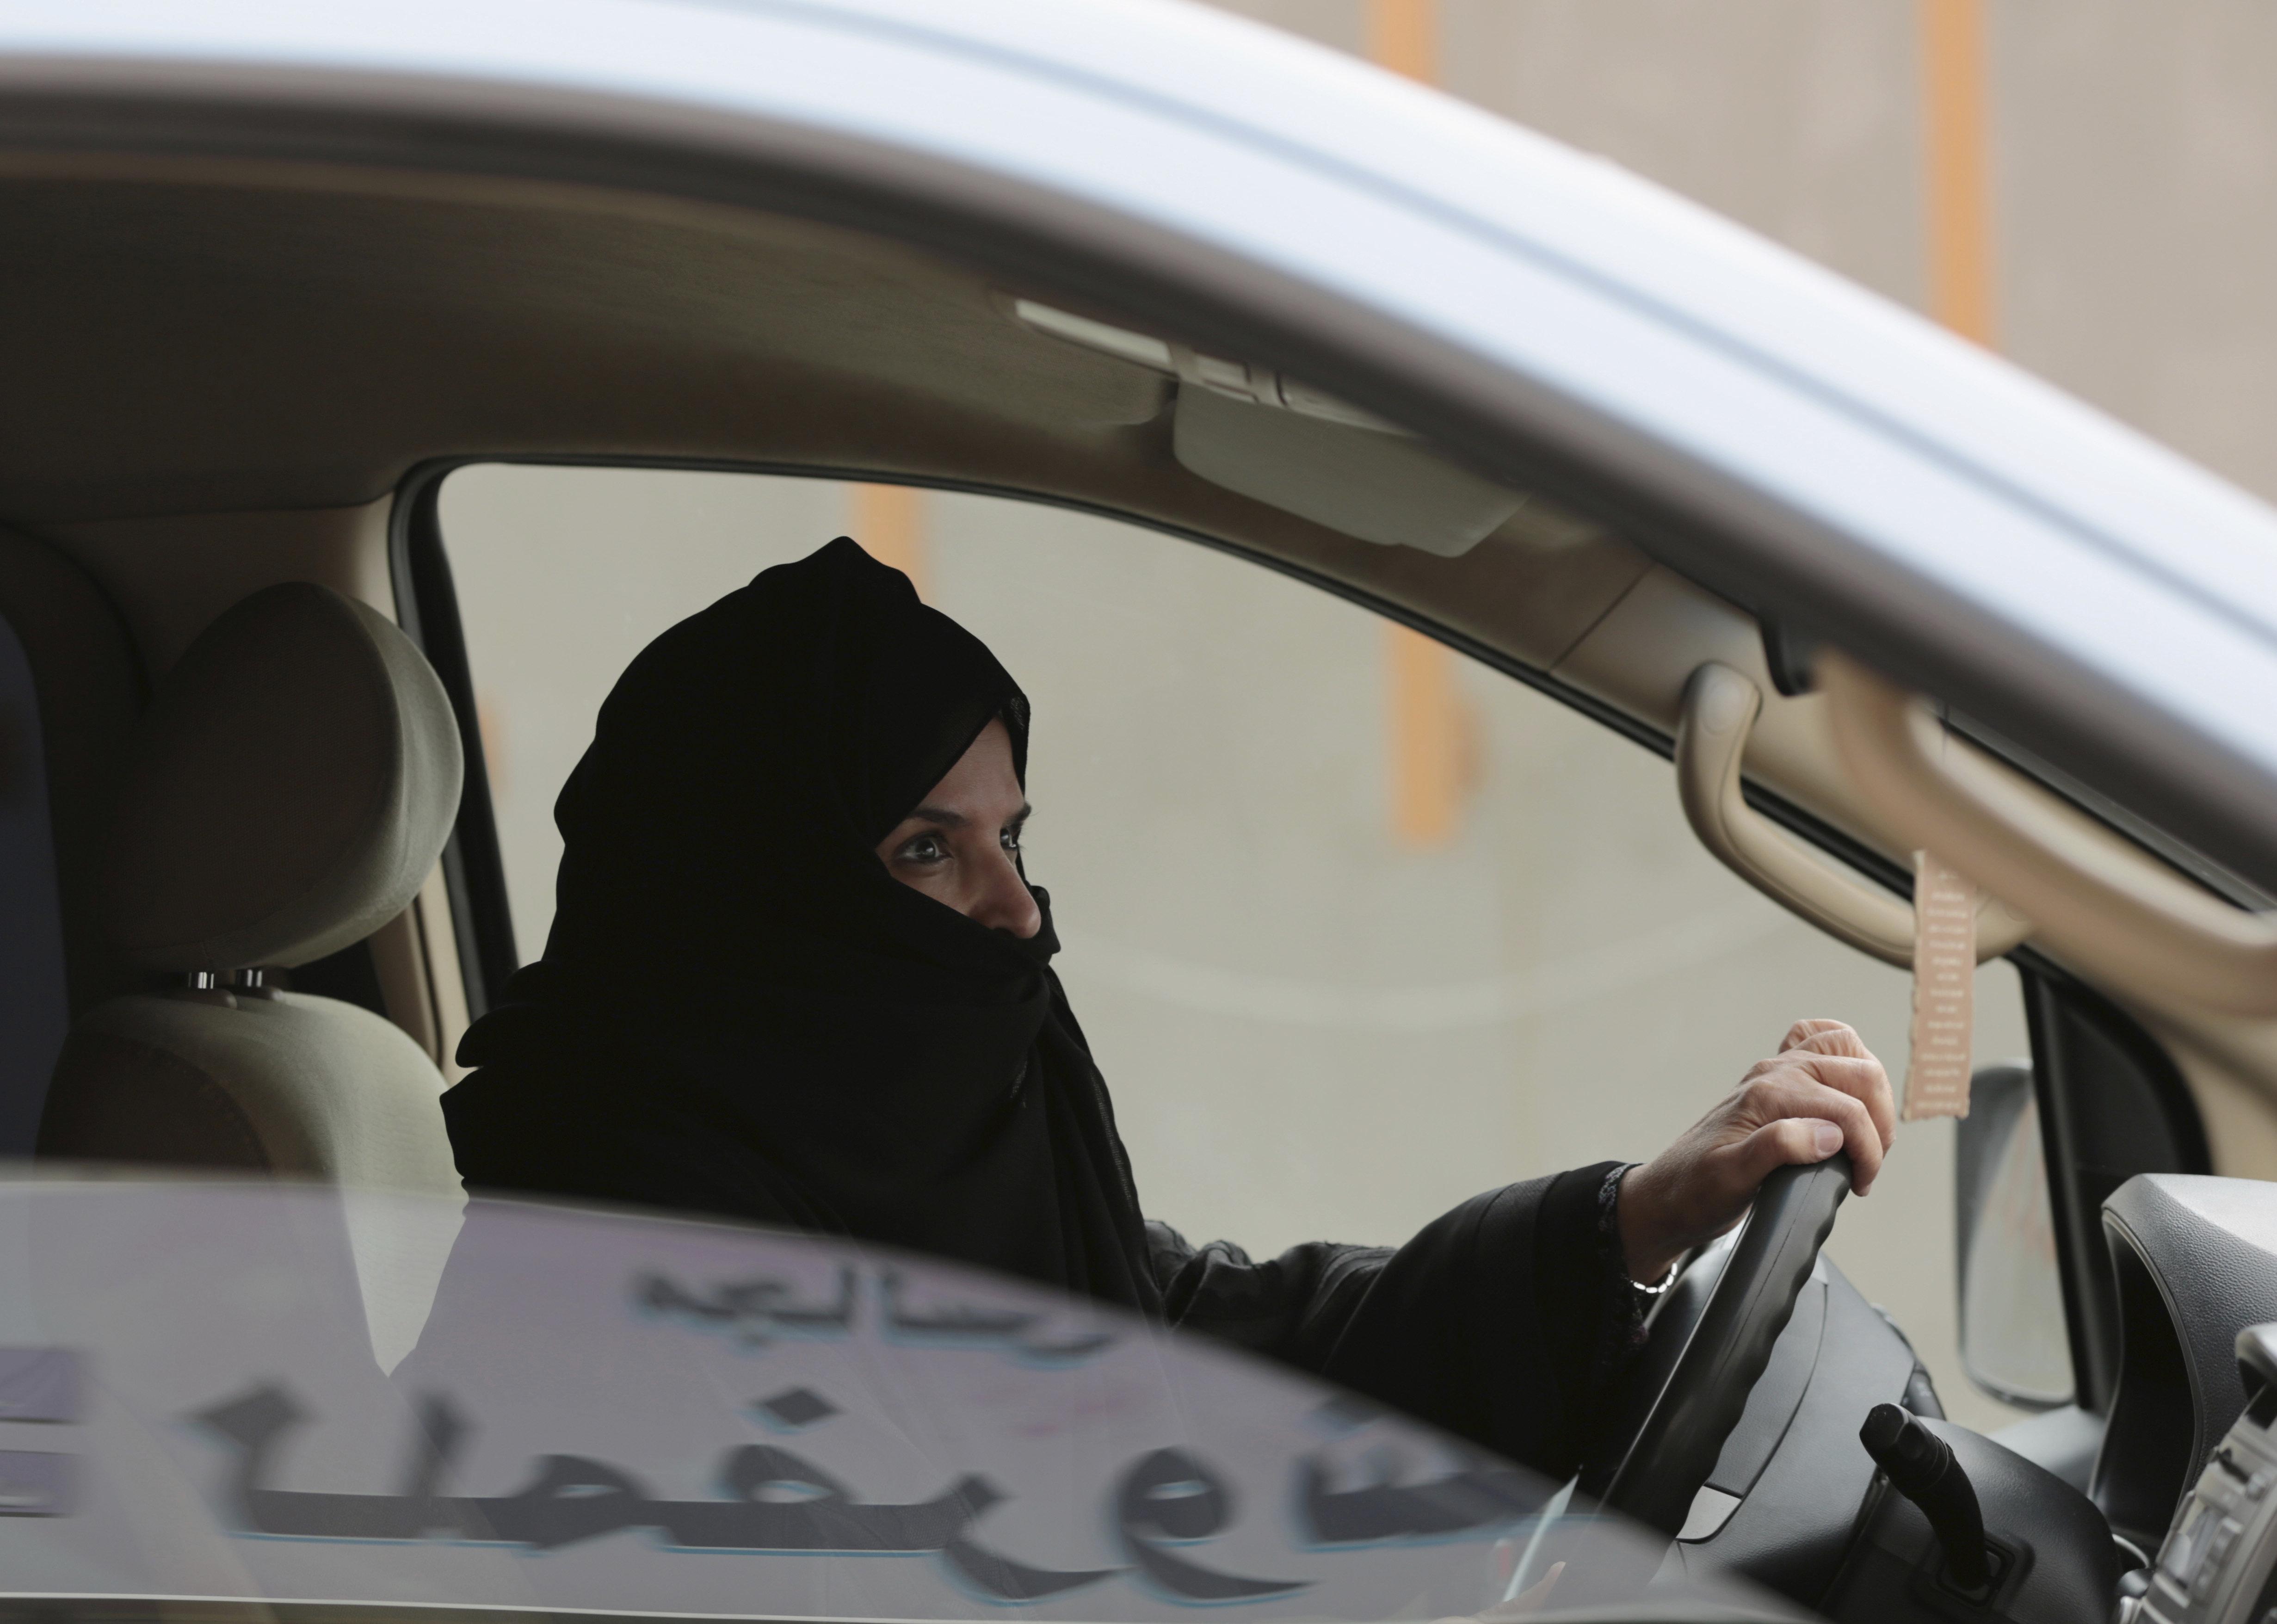 Saudi activist Aziza al-Yousef drives a car on a highway in Riyadh, Saudi Arabia, as part of a campaign to defy Saudi Arabia's then ban on women driving, March 29, 2014. (AP Photo/Hasan Jamali)